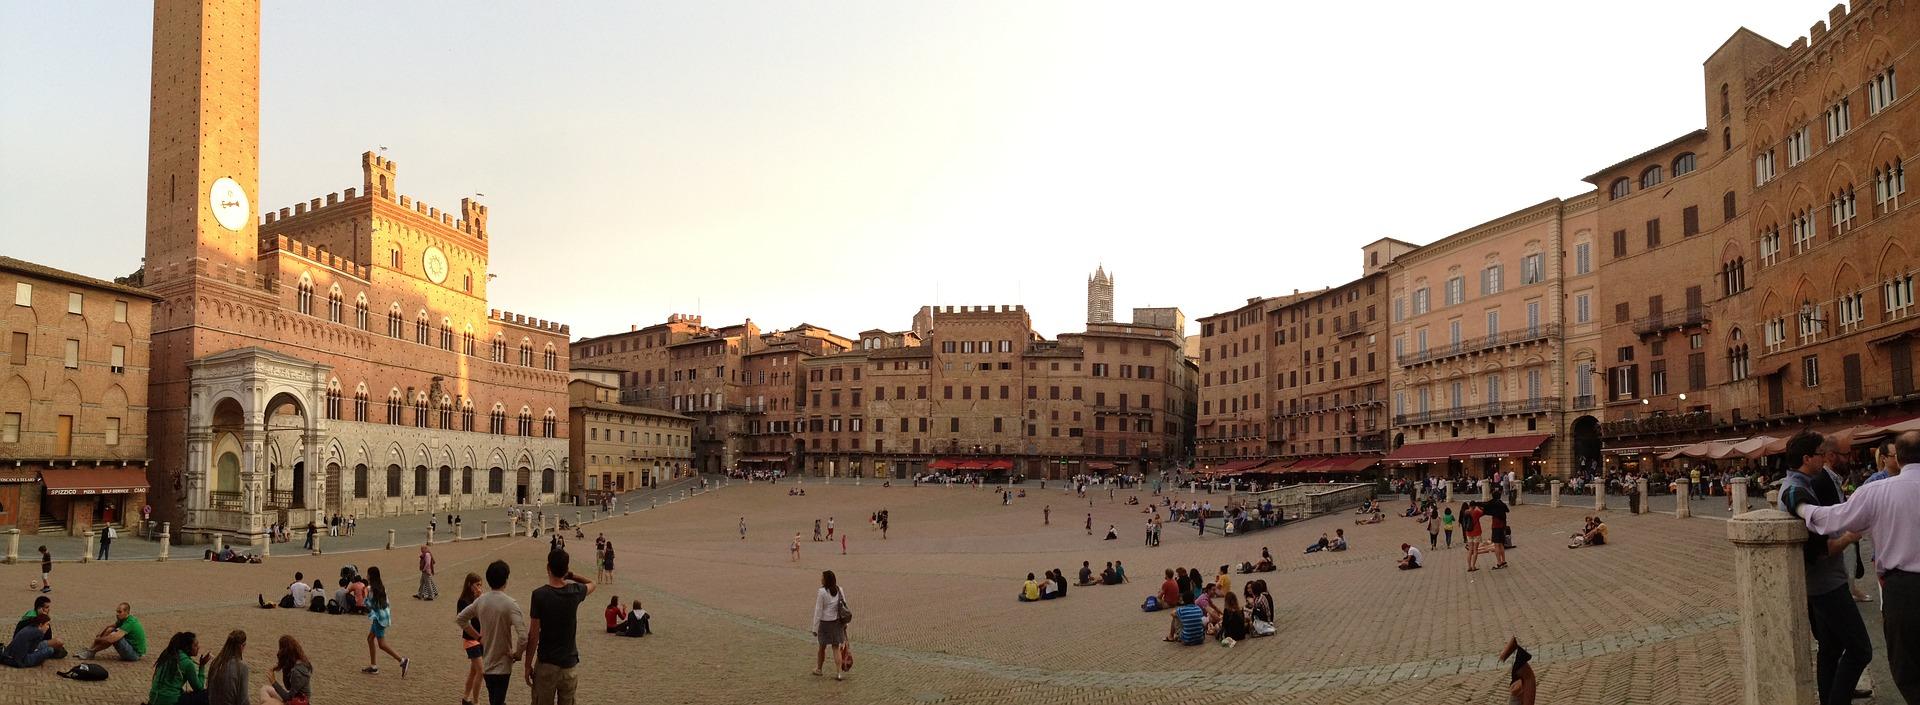 Siena, Piazza del Campo Tuscany